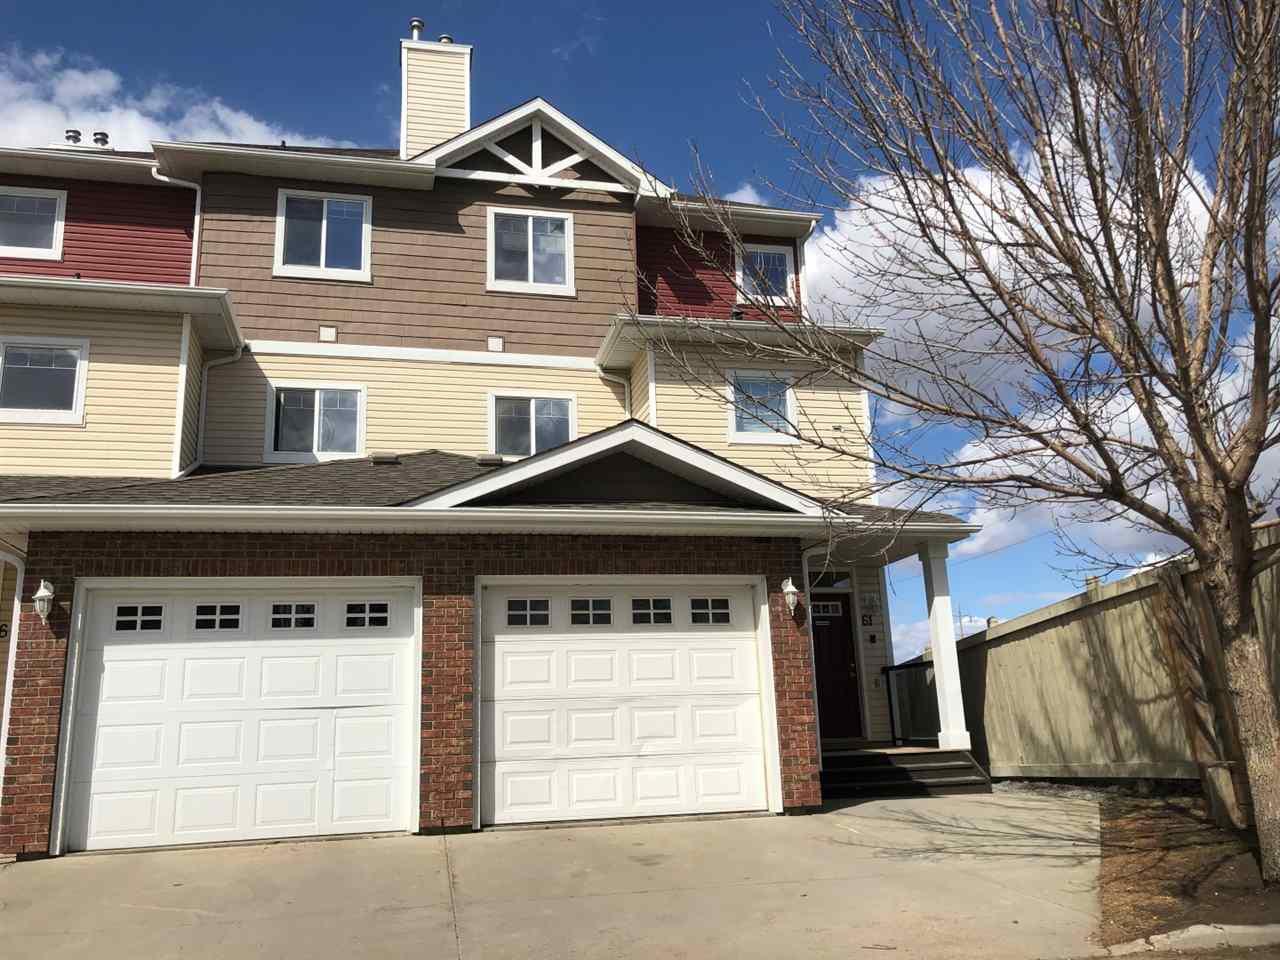 Main Photo: 62 3010 33 Avenue in Edmonton: Zone 30 Townhouse for sale : MLS®# E4193215